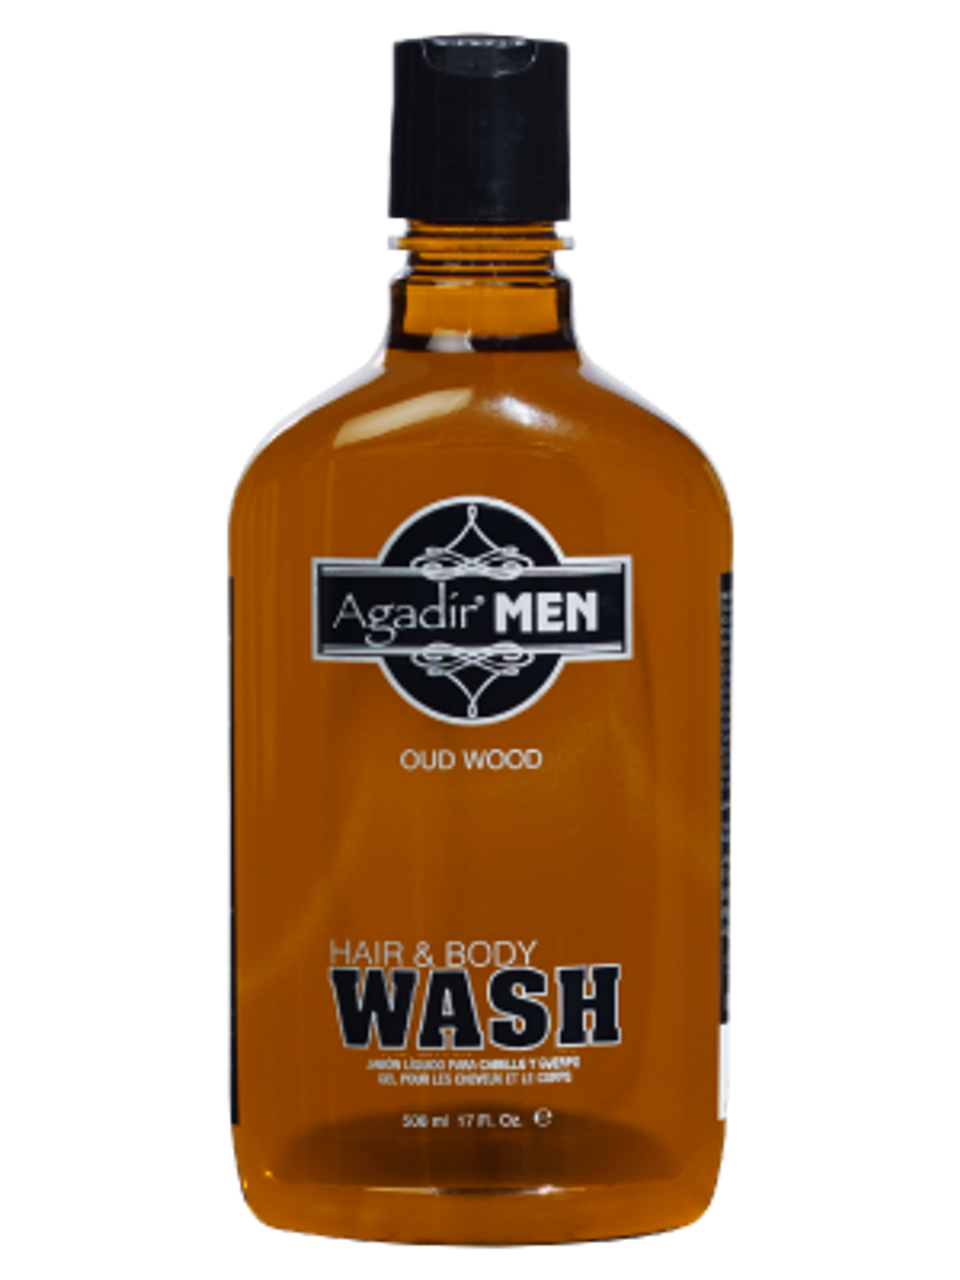 Agadir Hair & Body Wash - Large